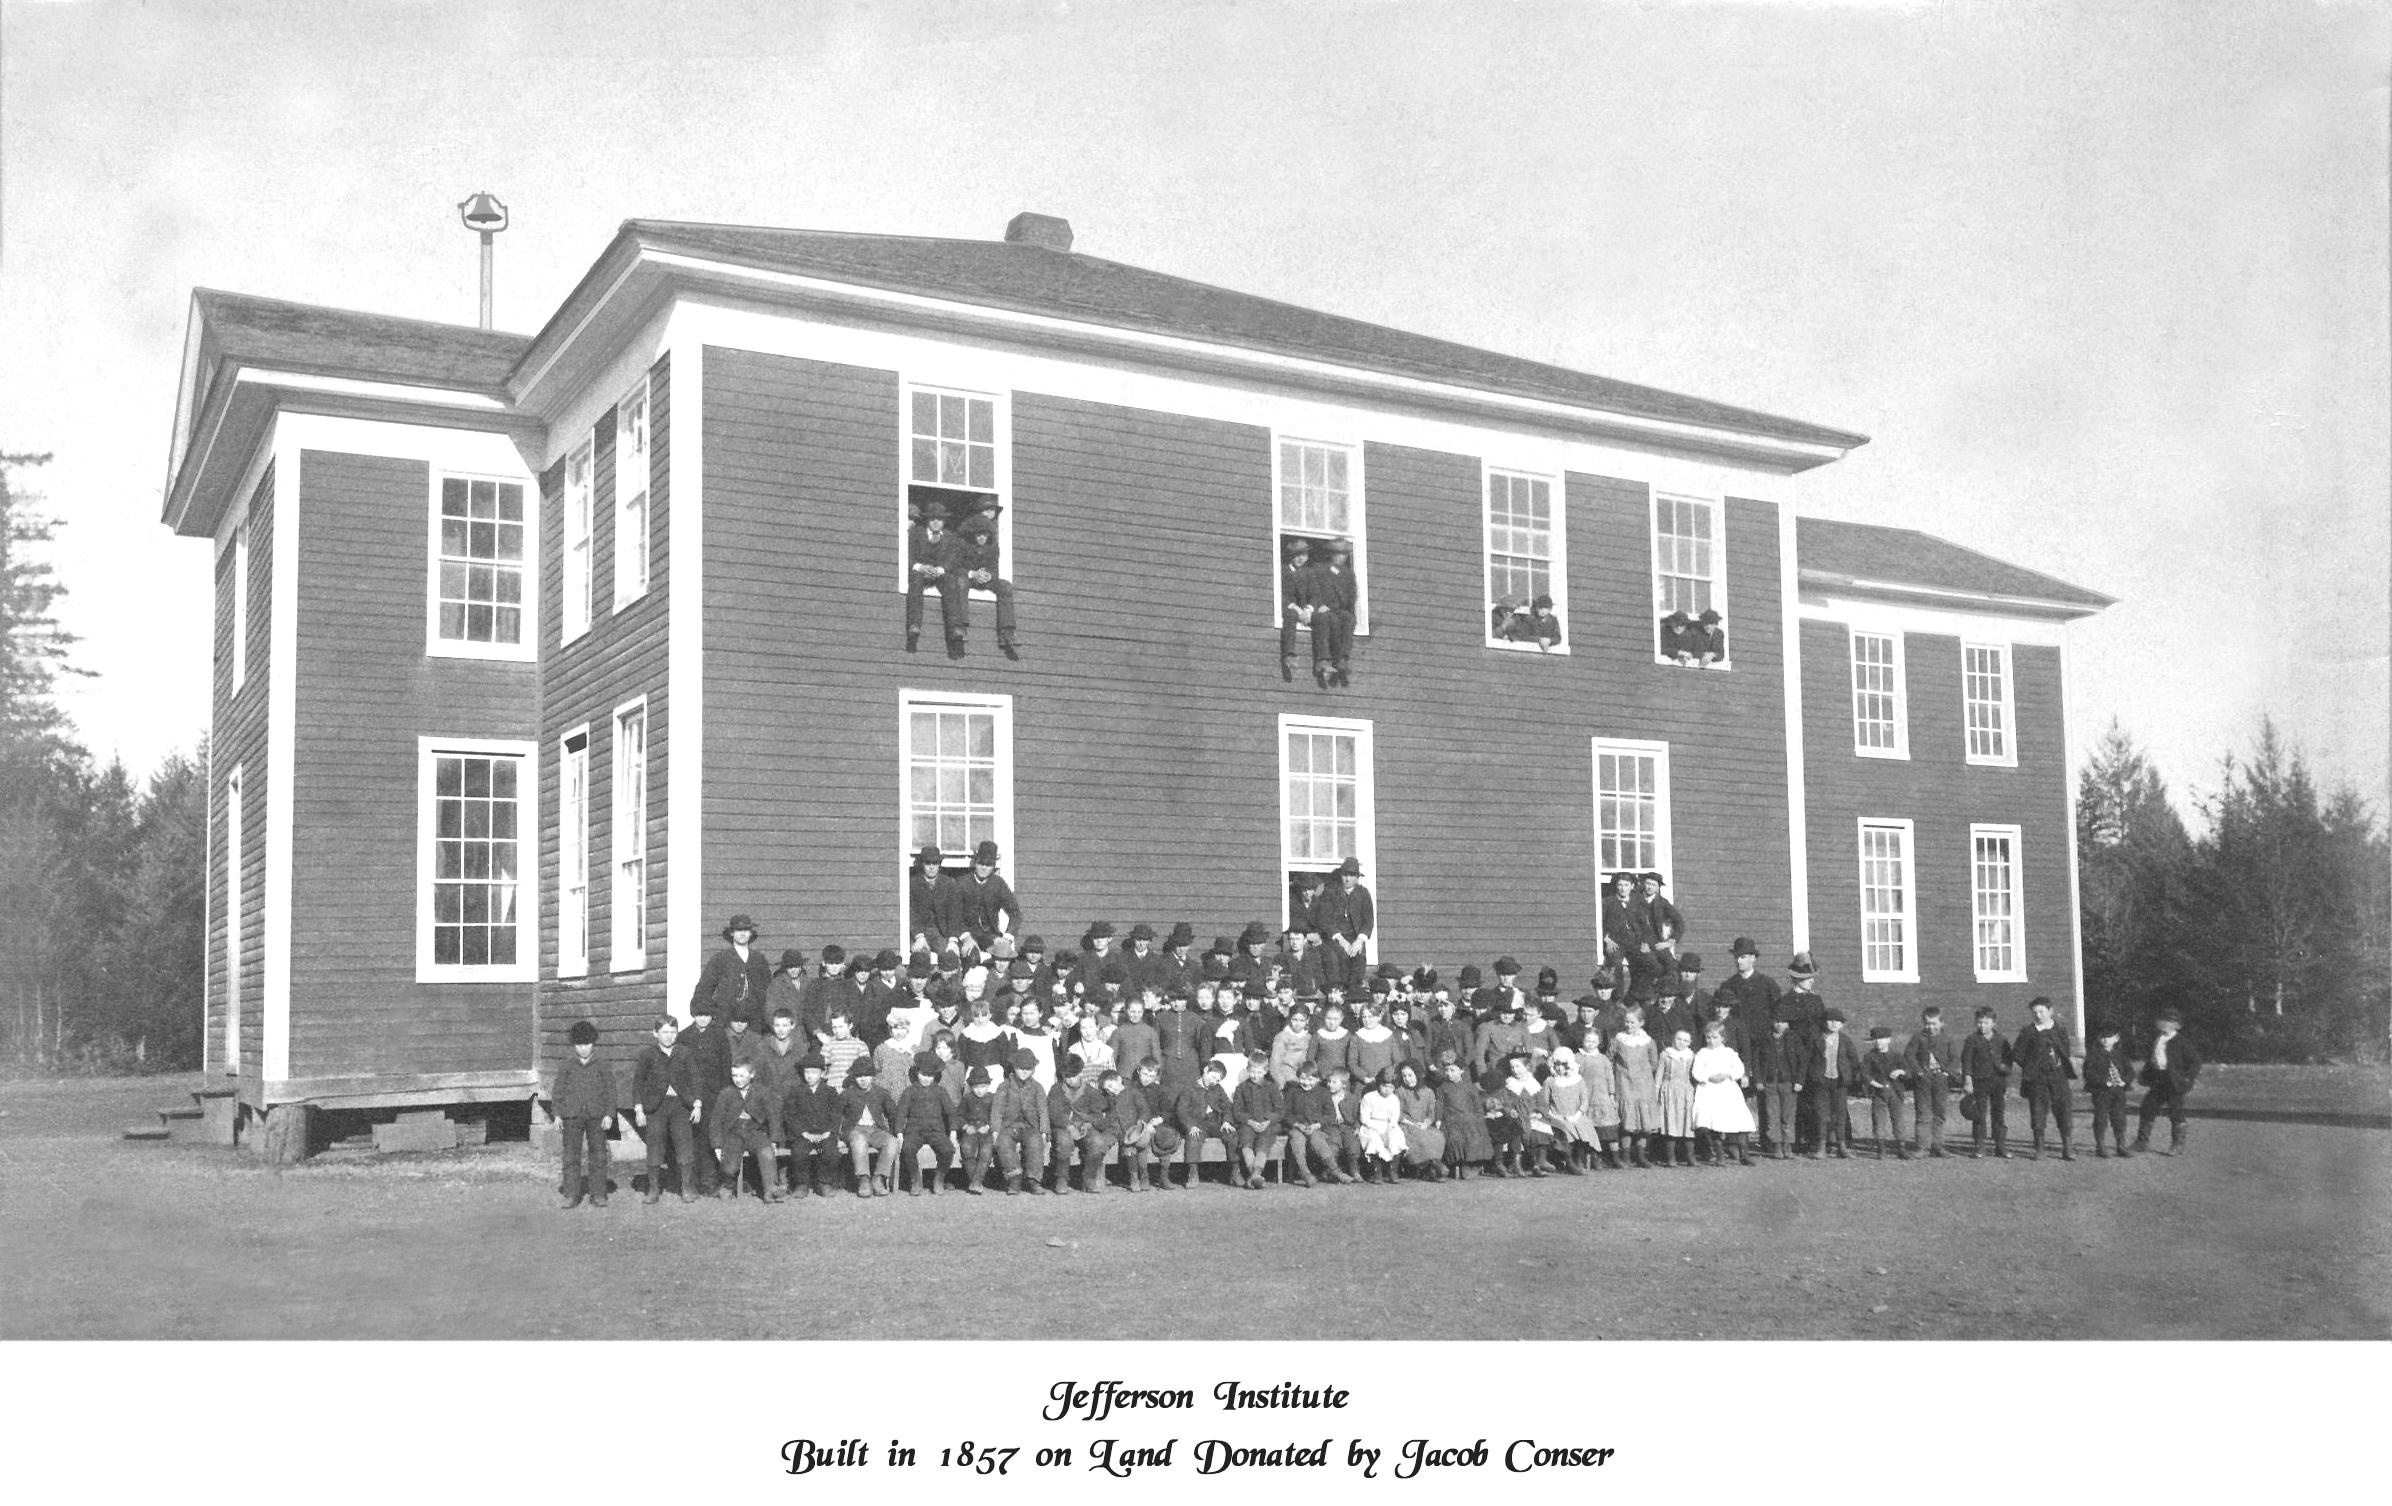 JeffersonInstitute1857.jpg